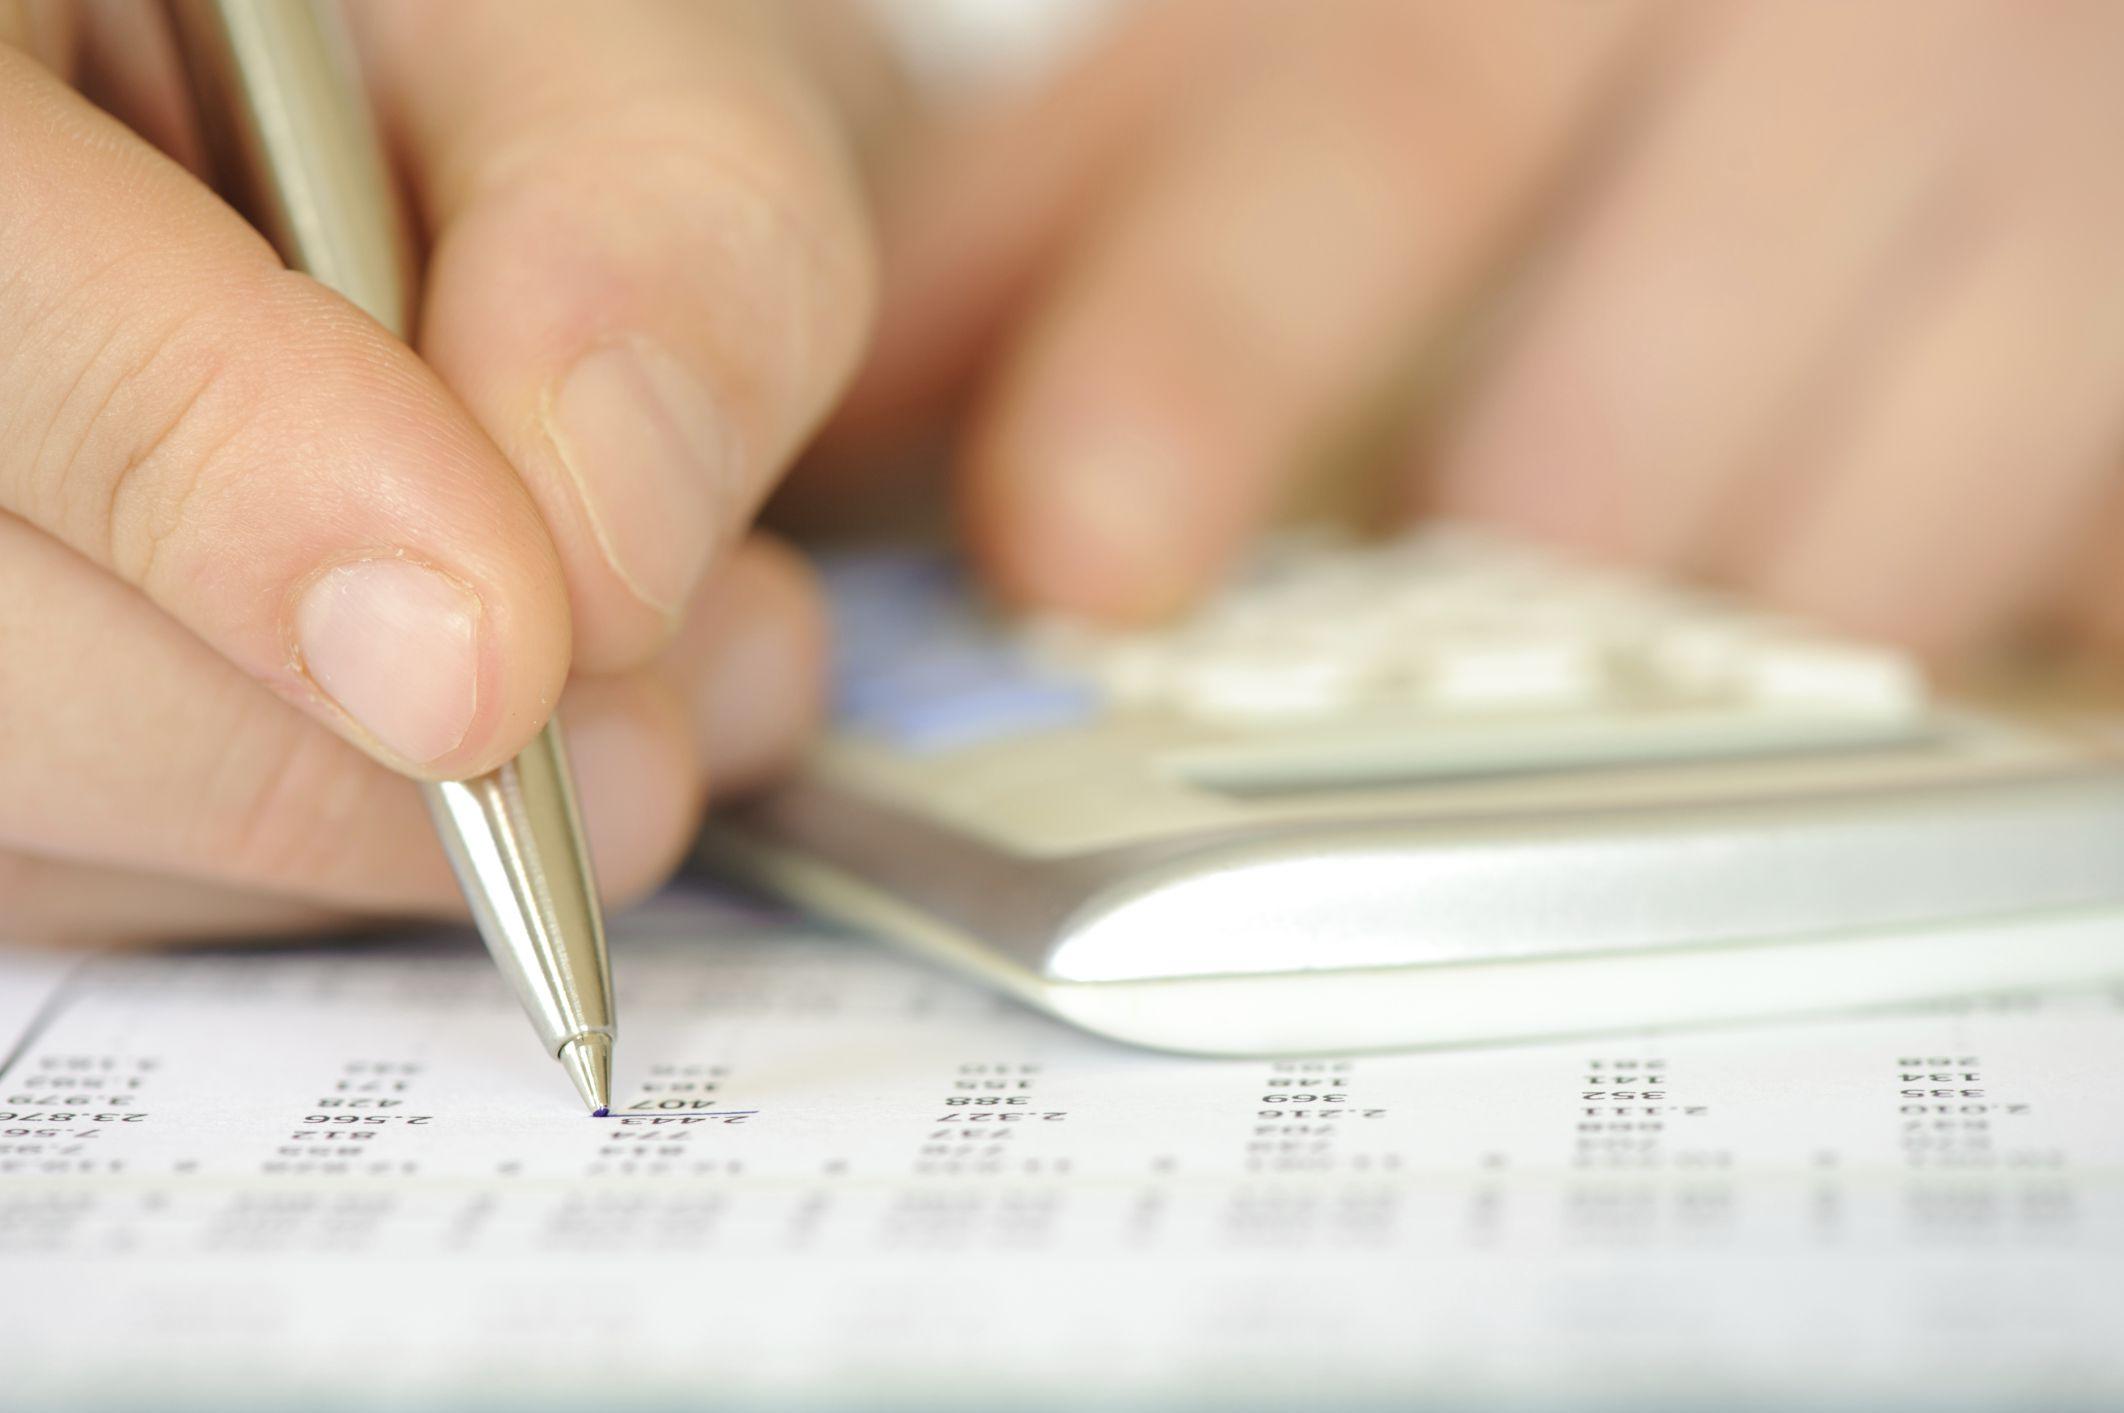 worksheet Maryland Child Support Worksheet nebraska child support calculator worksheets tips how to